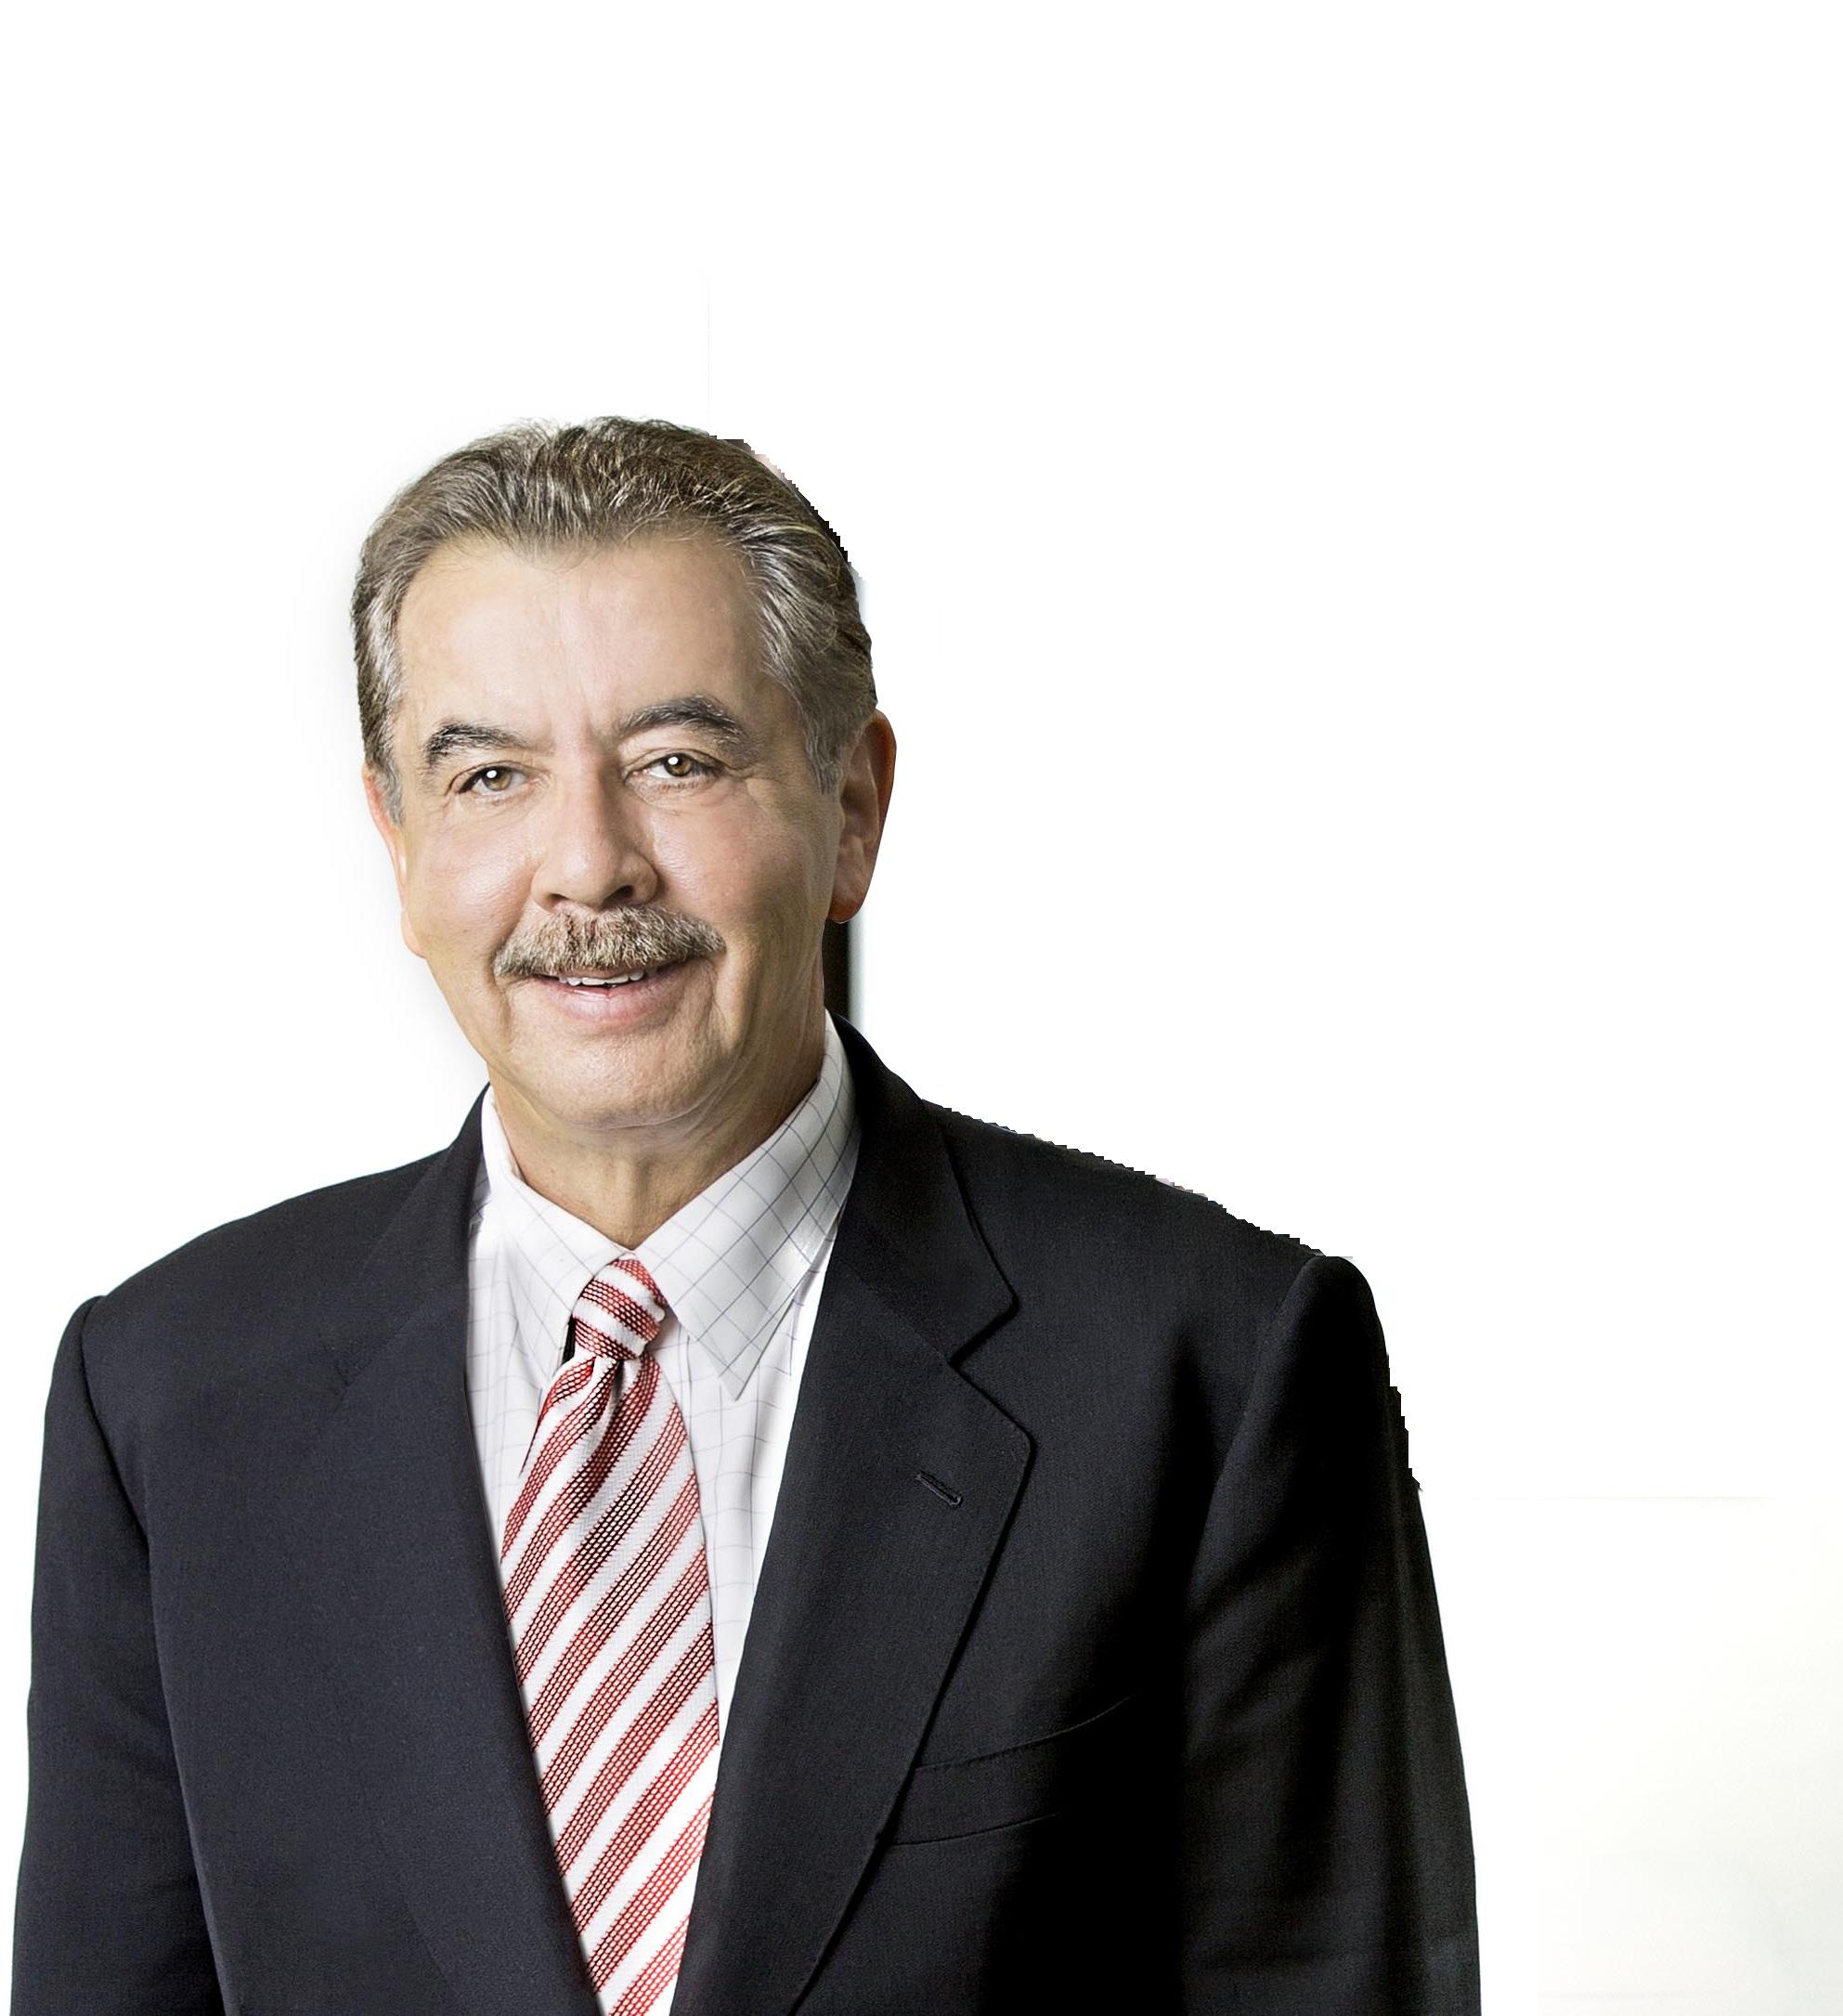 Lic. Guillermo Hopkins Gamez, Director General de Casa de Moneda de México